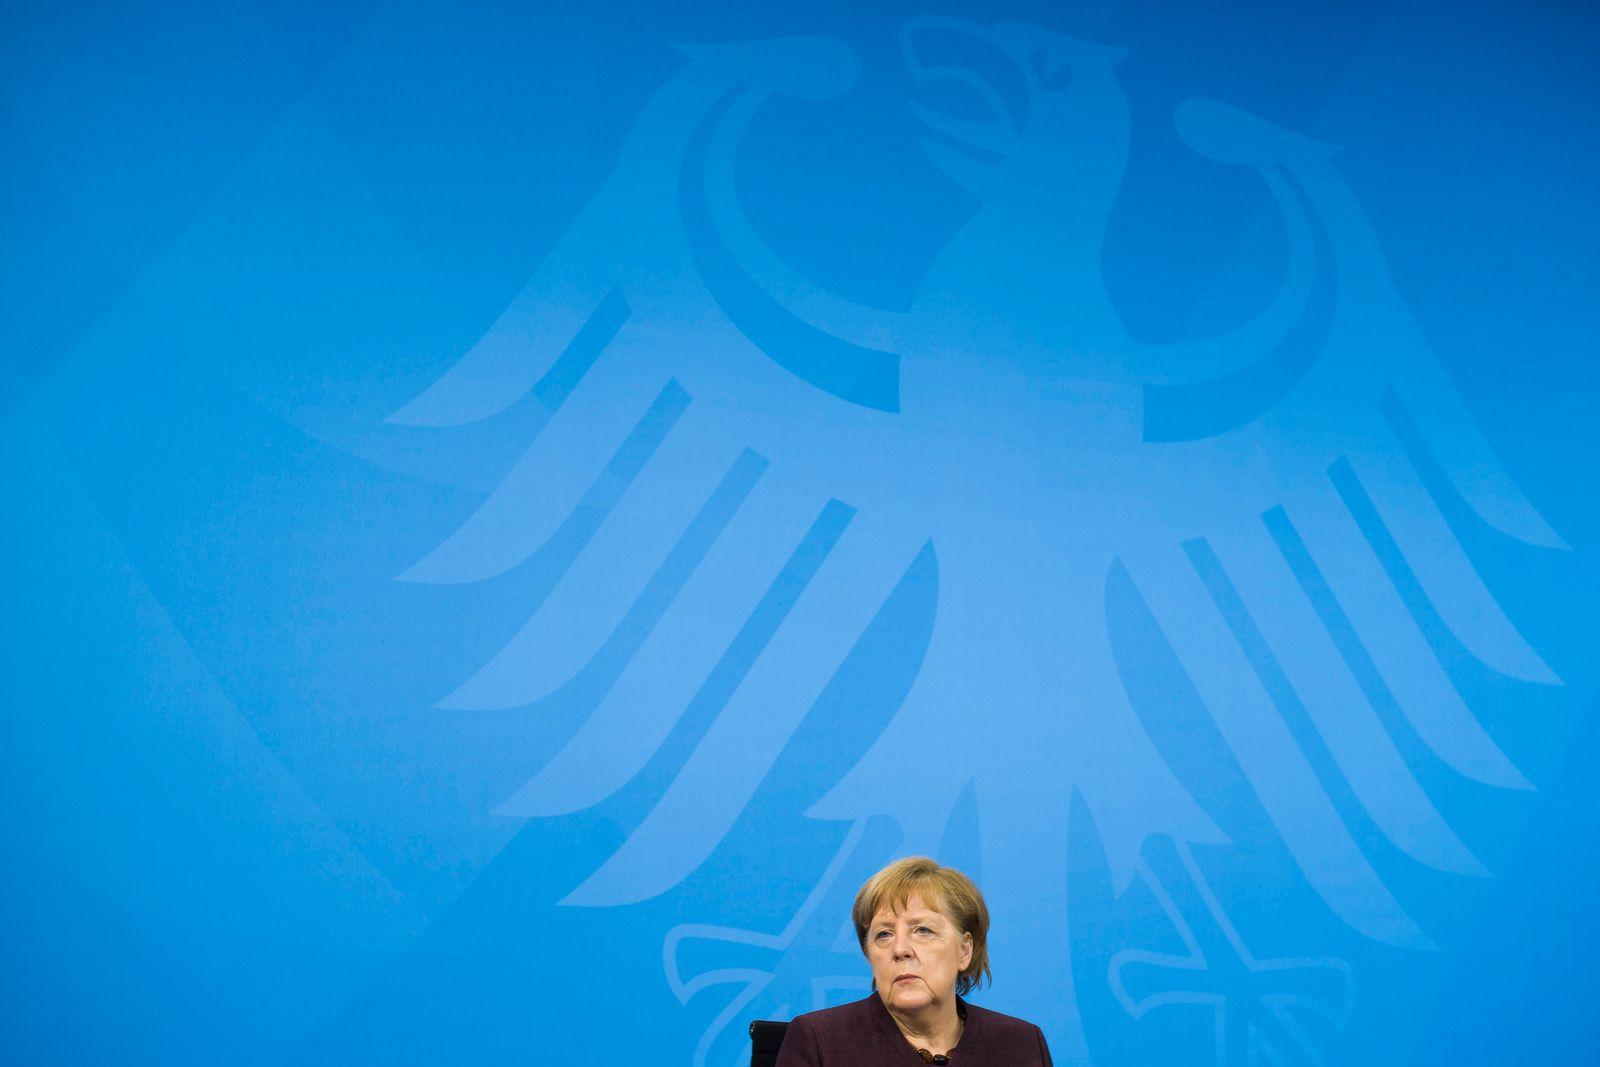 Pressekonferenz Bundeskanzlerin Angela Merkel